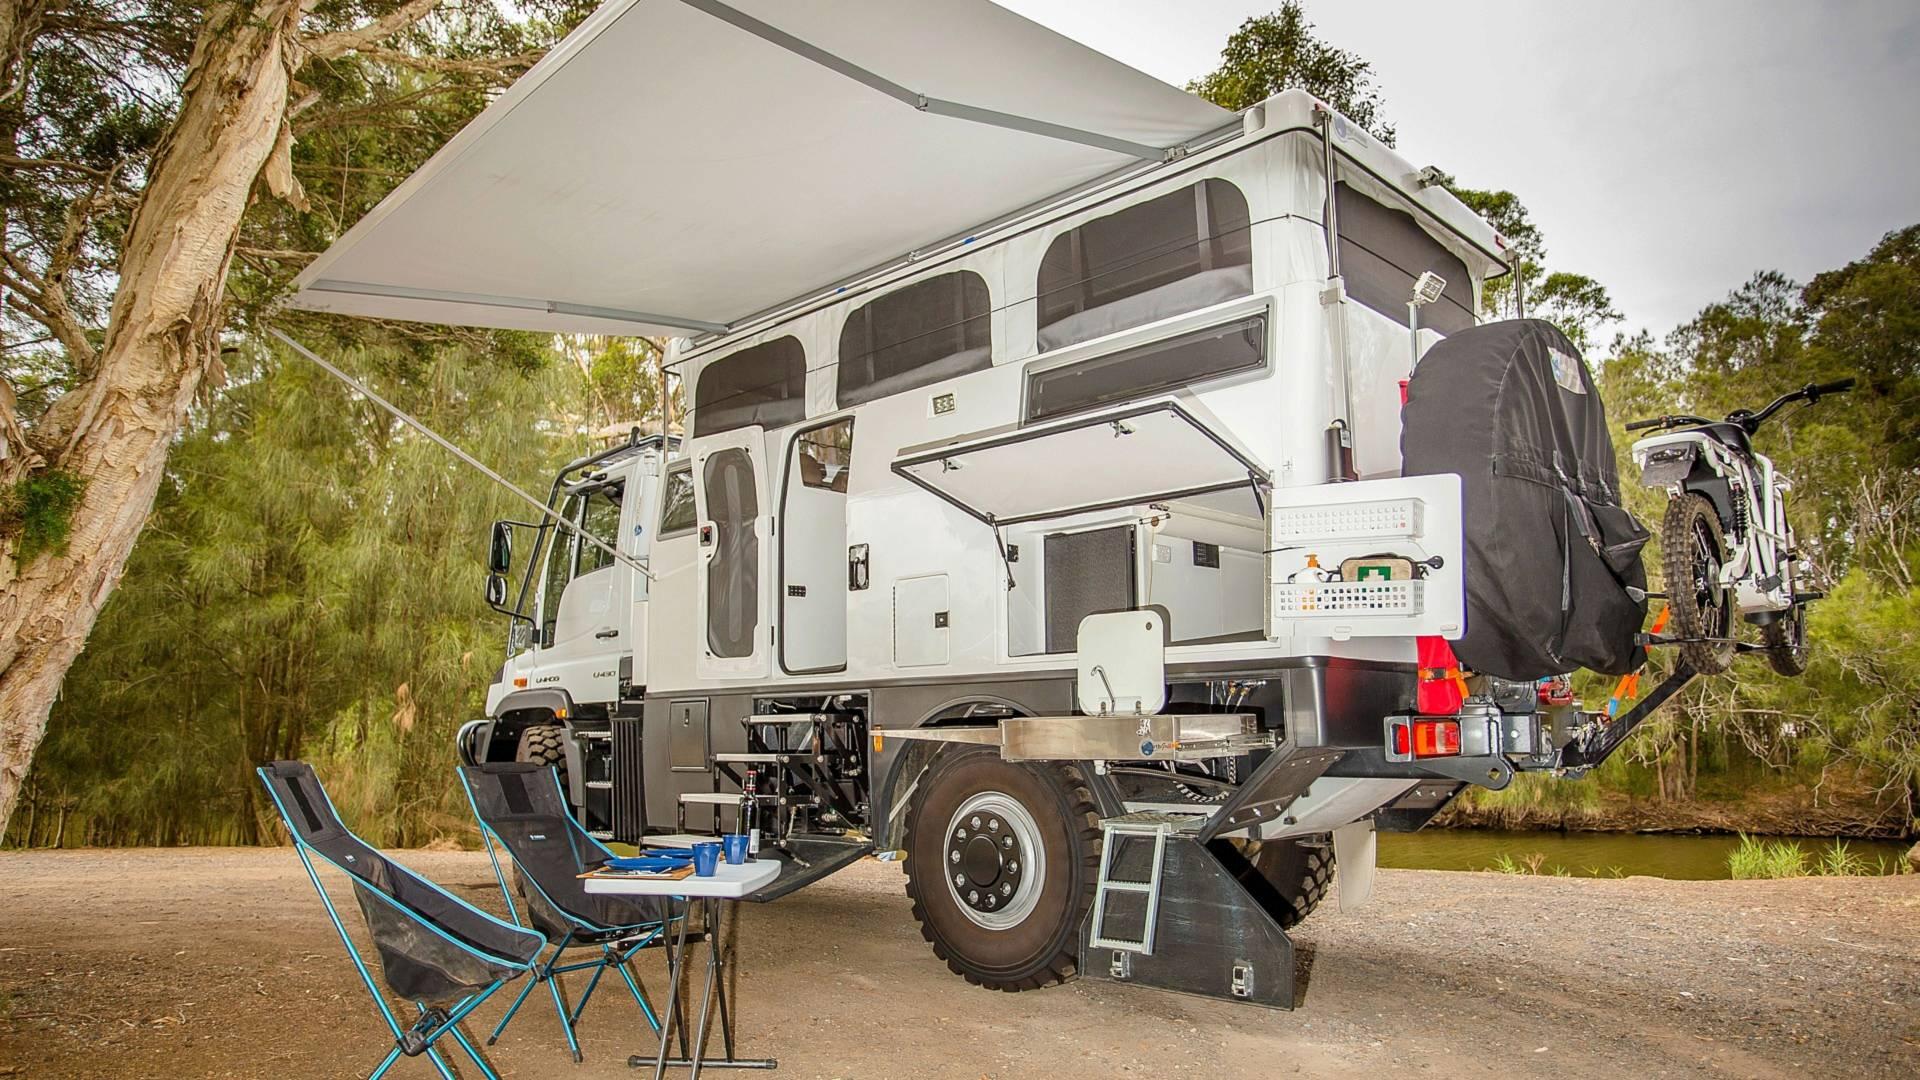 EarthCruiser_Australia_Unimog_Explorer_XPR440_02